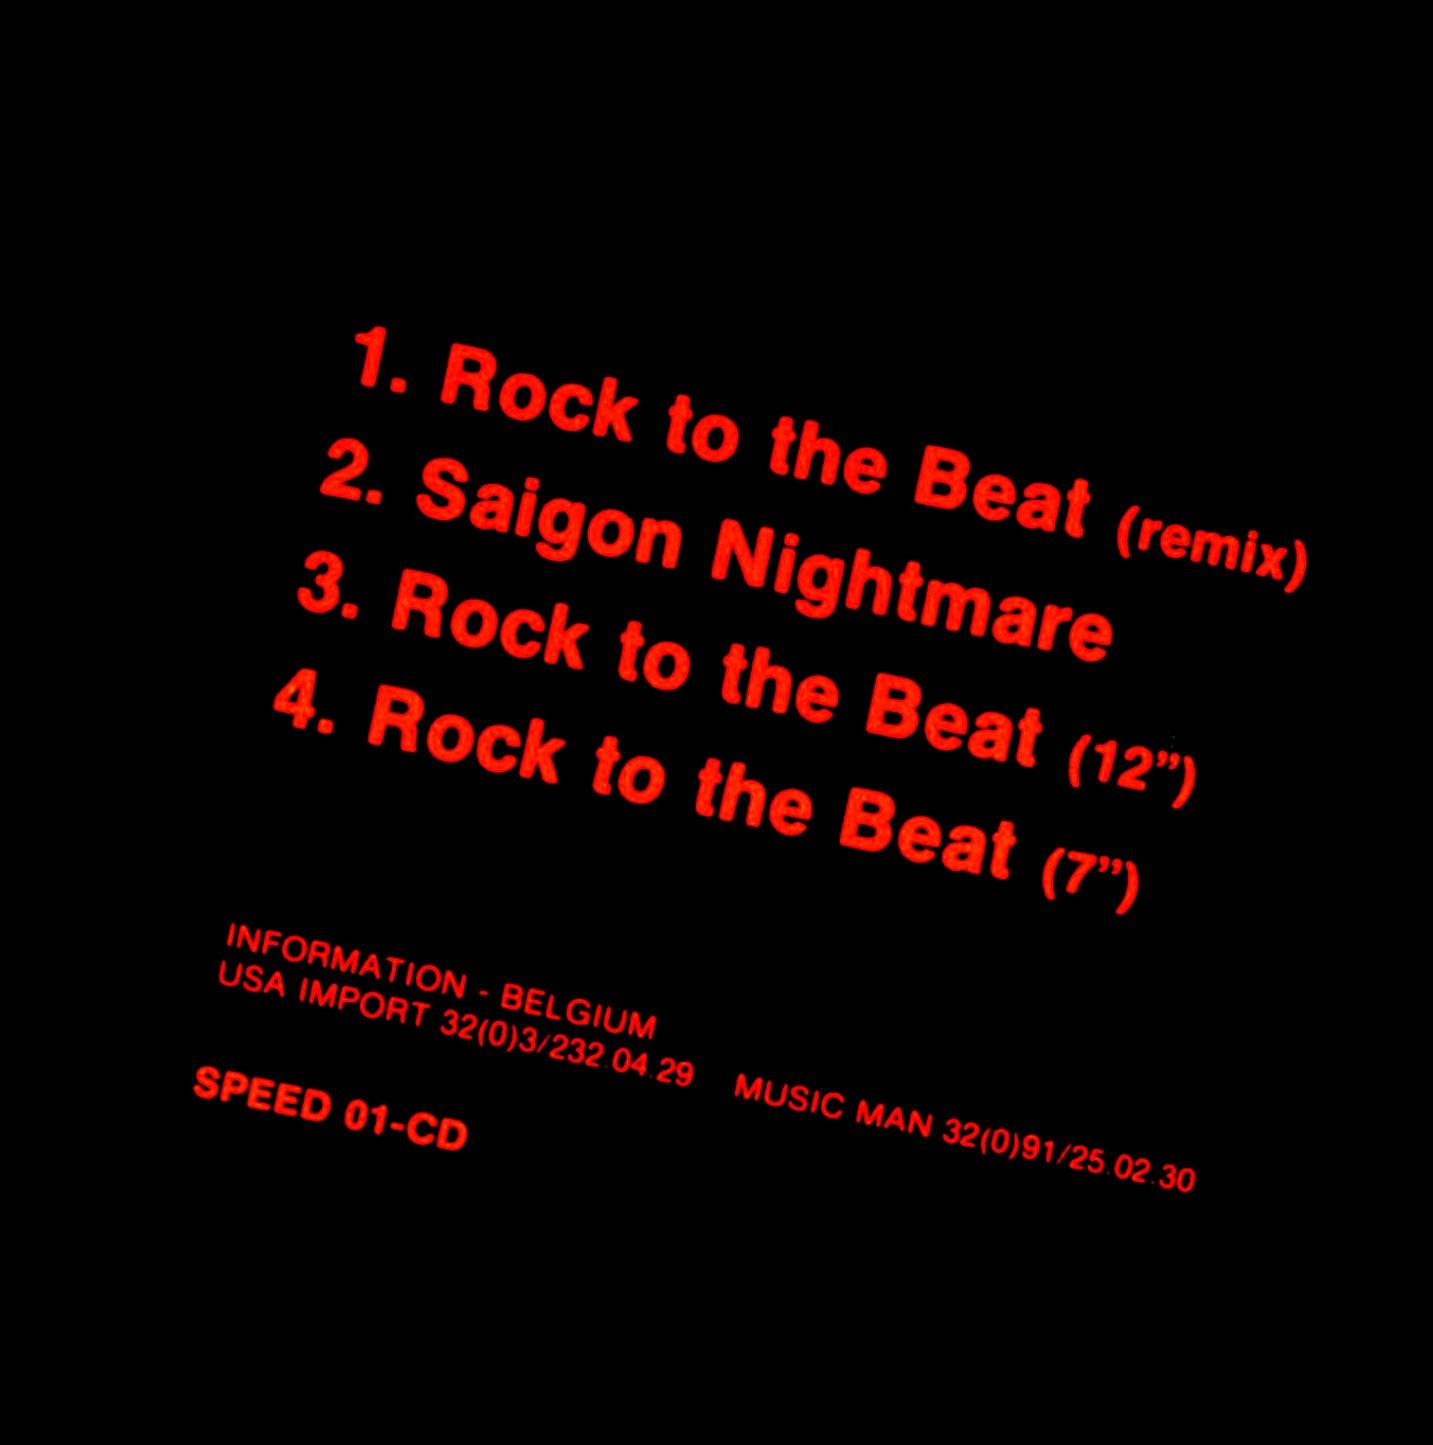 Praga Khan Featuring Jade 4U* Praga Khan Feat. Jade 4U - Injected With A Poison (Digital Orgasm Remixes)